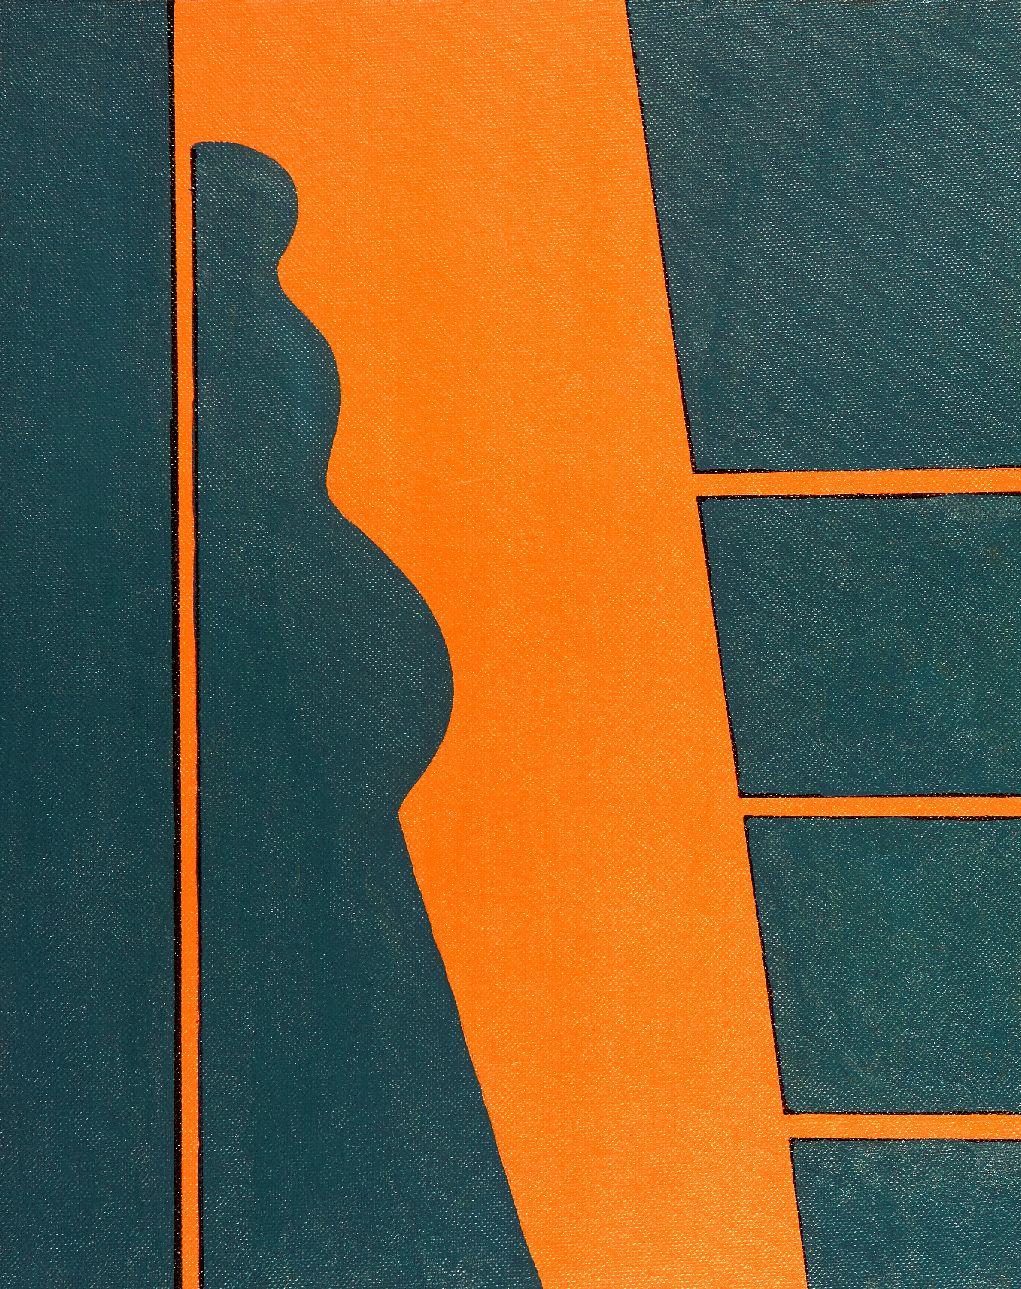 IMG 0028 Deim Pál - Távozóban - 2007 3